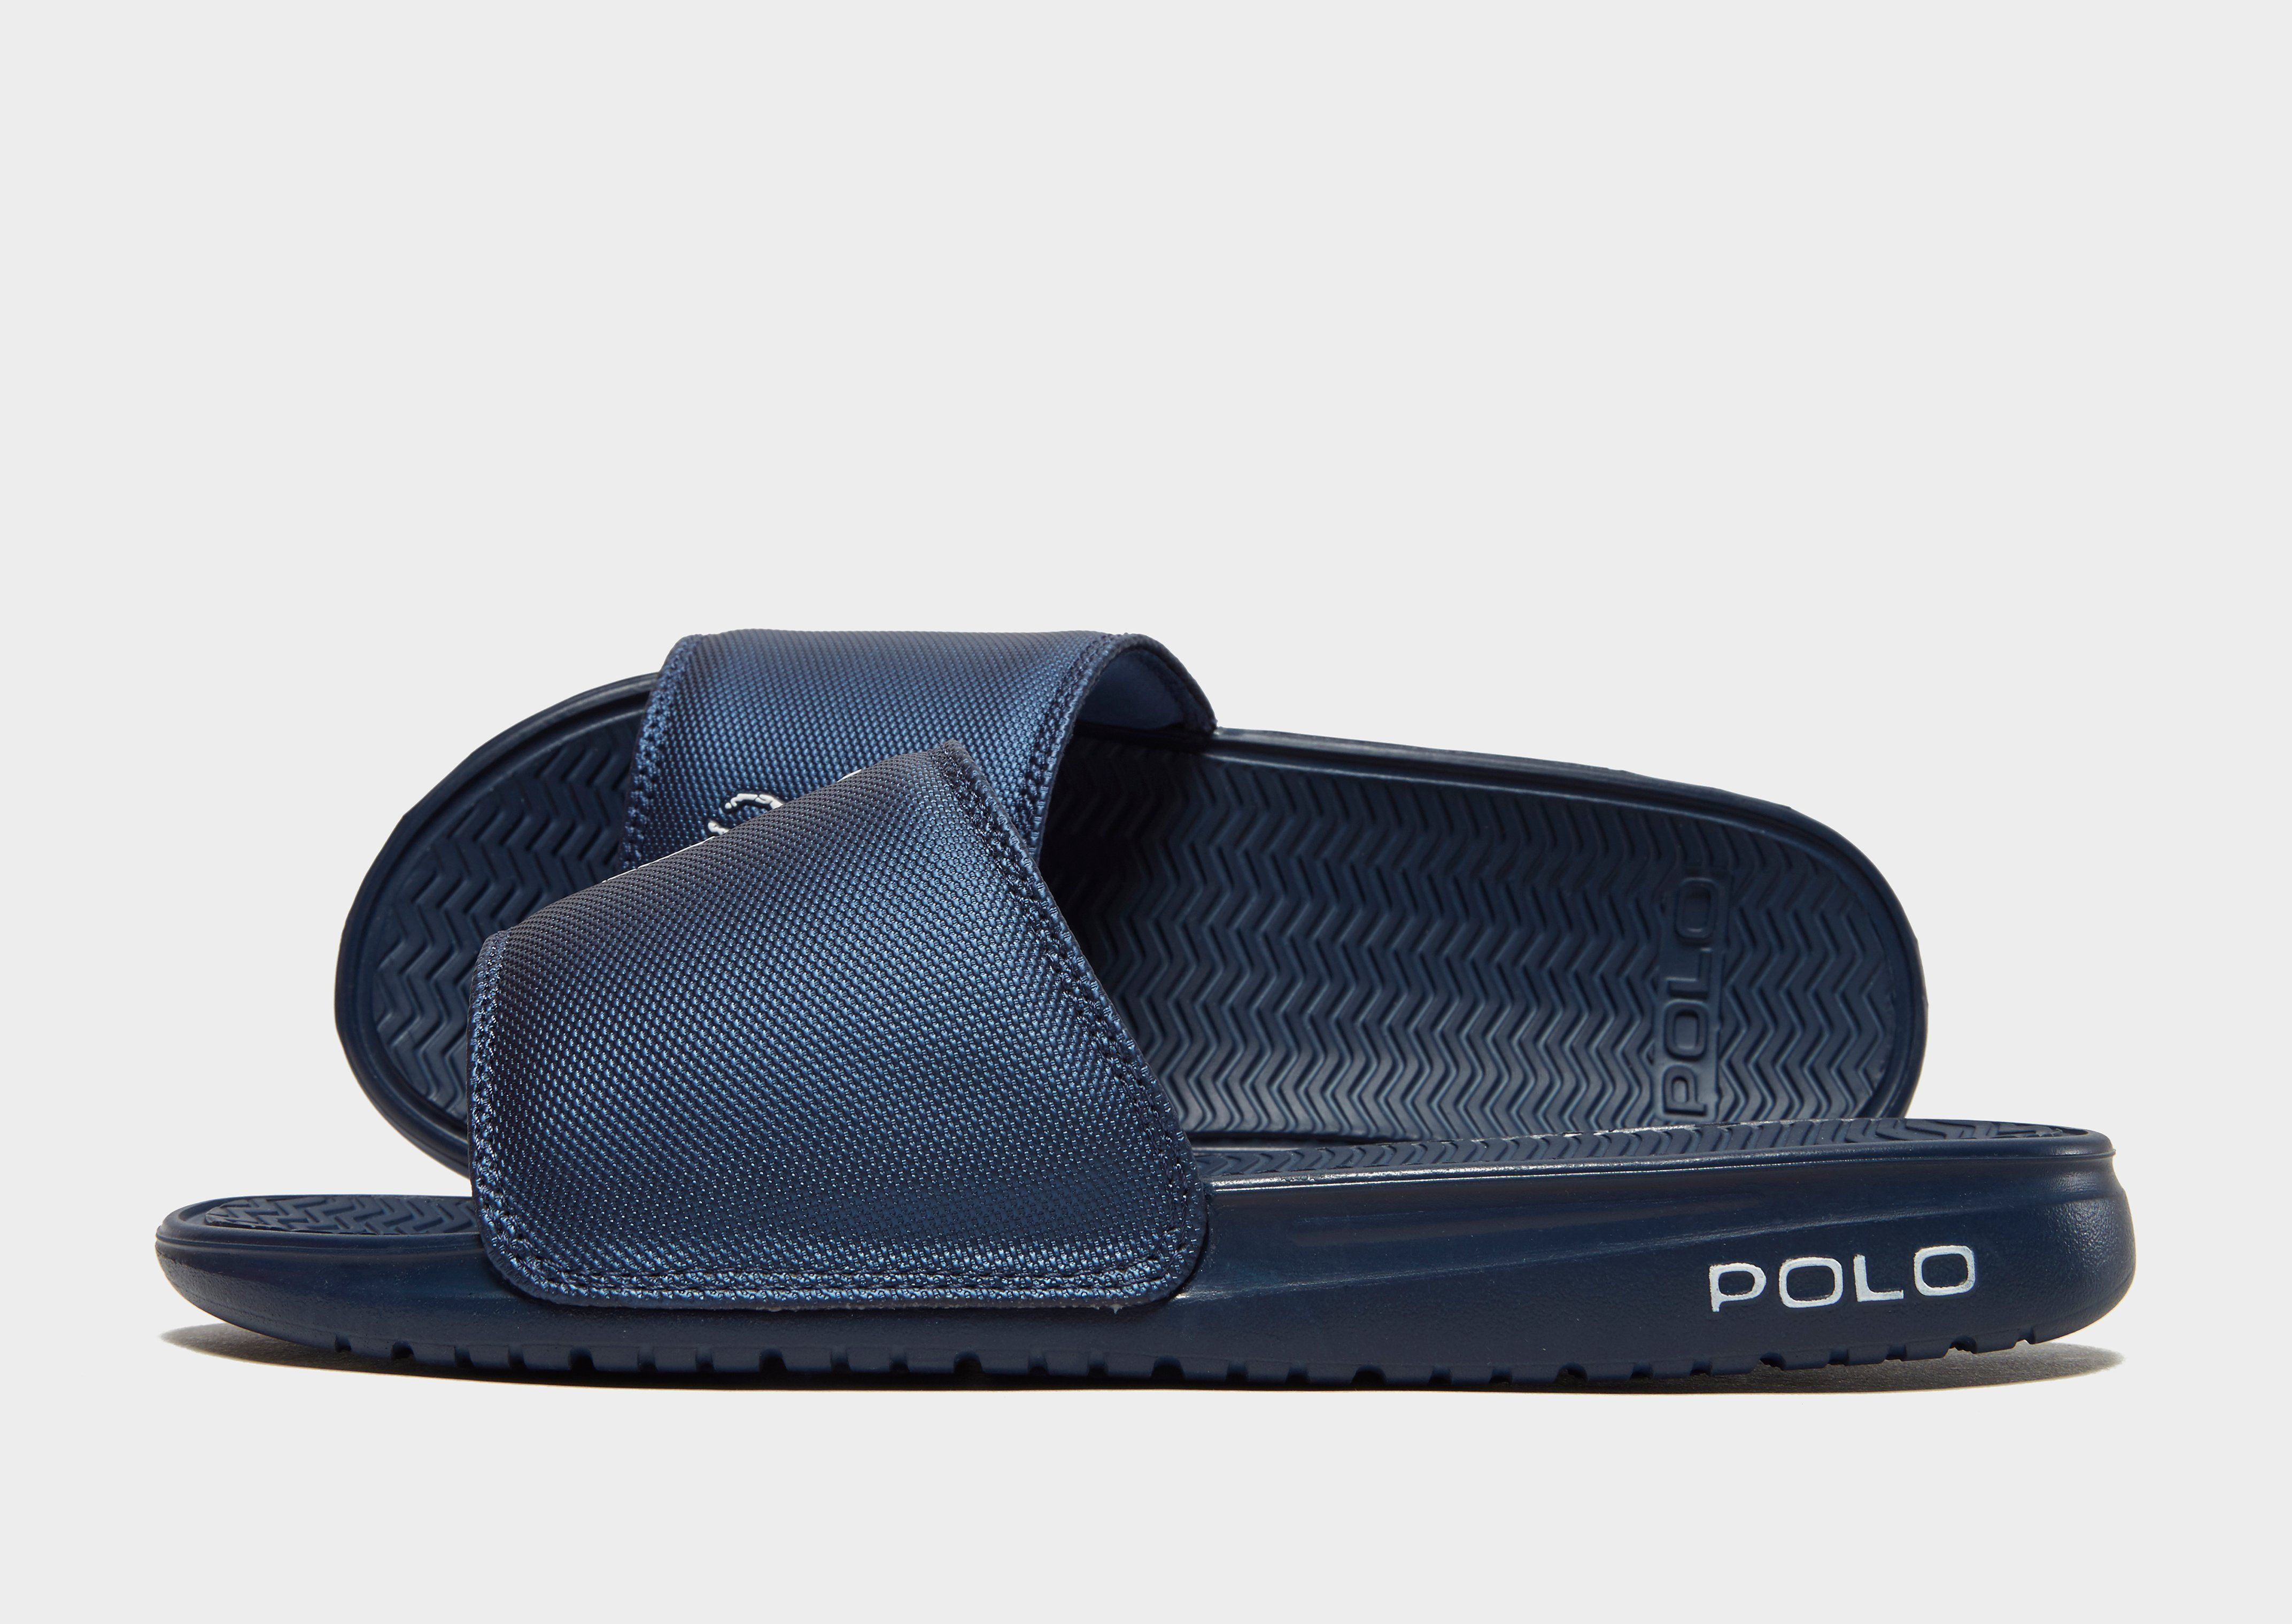 8d3103fa5dd3 Polo Ralph Lauren Rodwell Slides